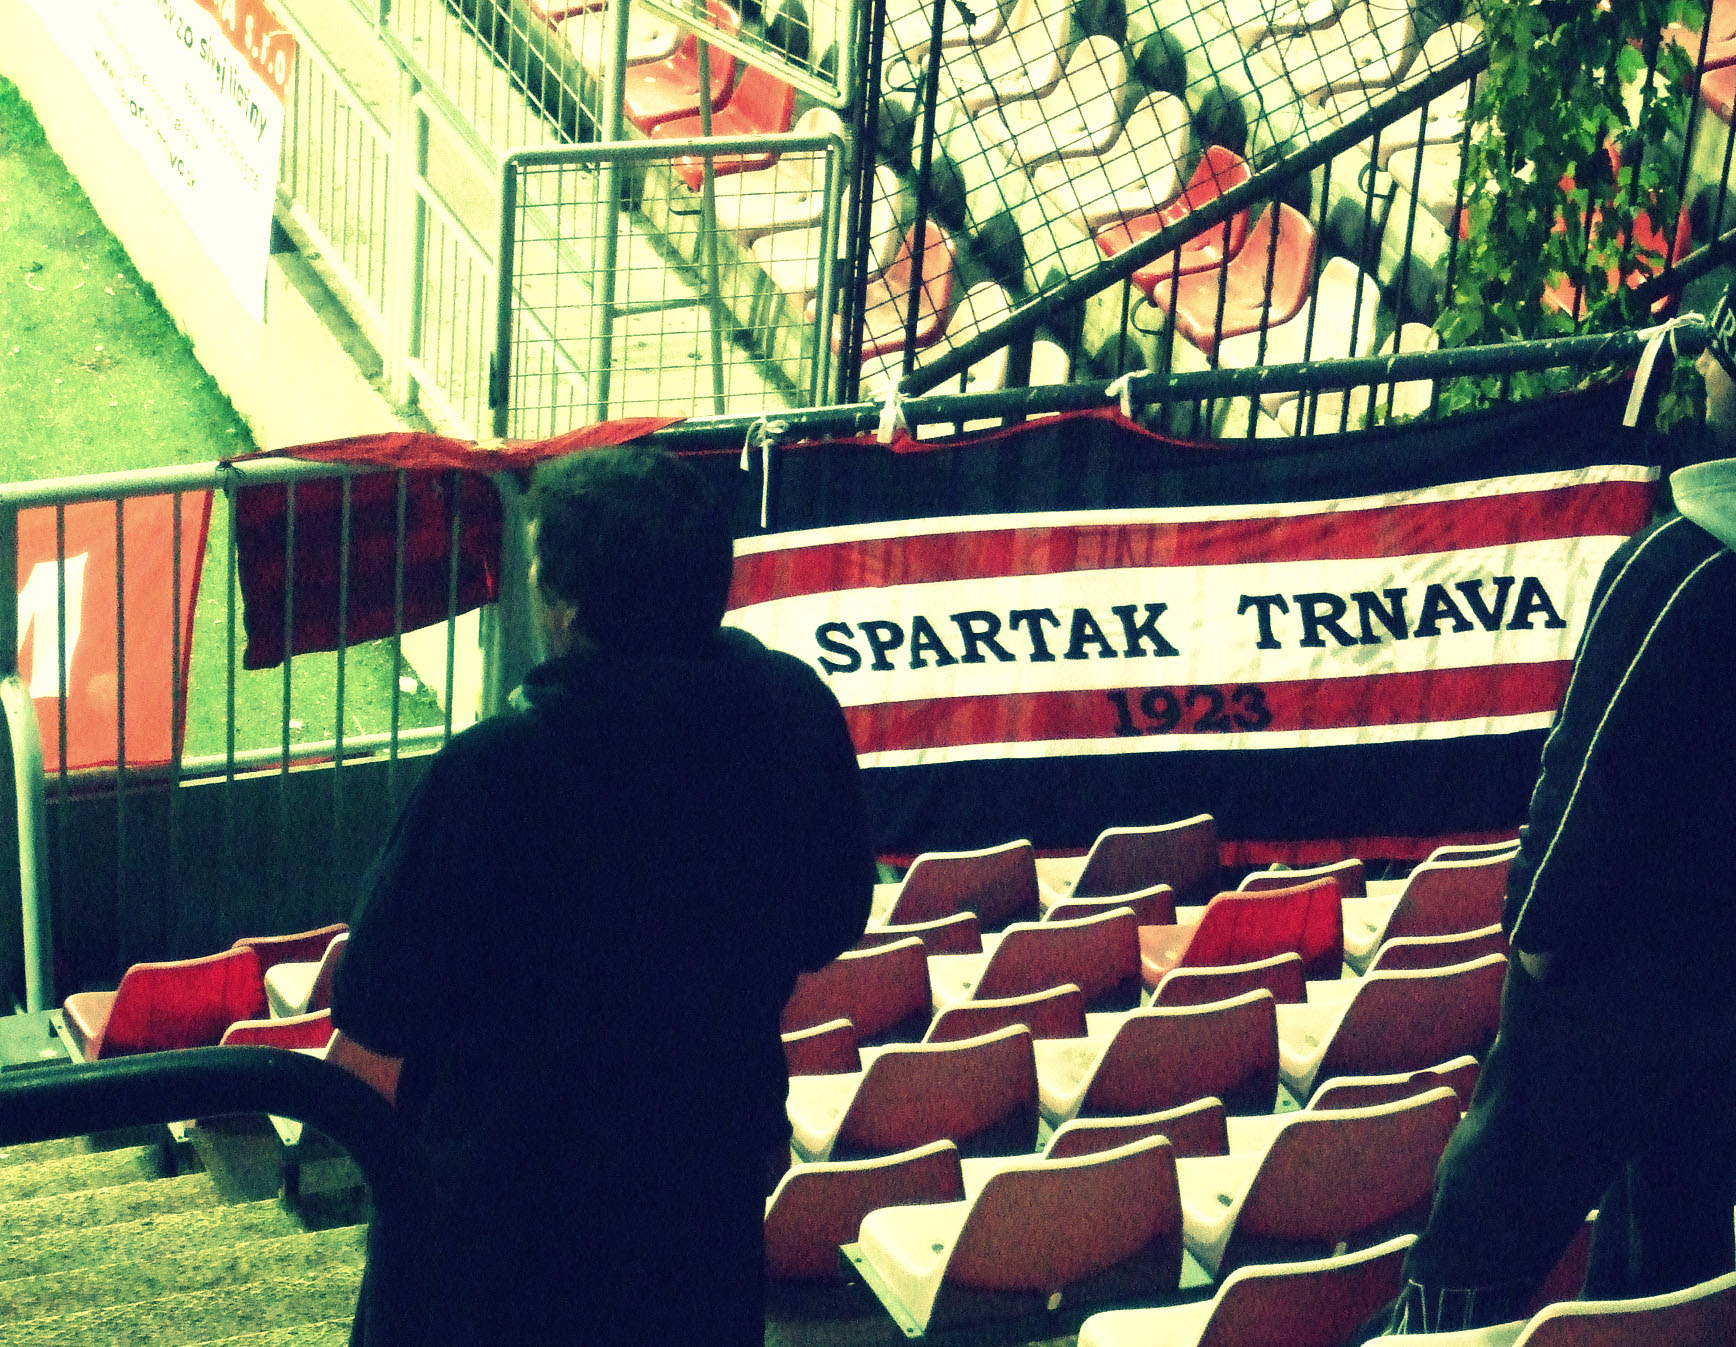 Spartak Trnava1.jpg